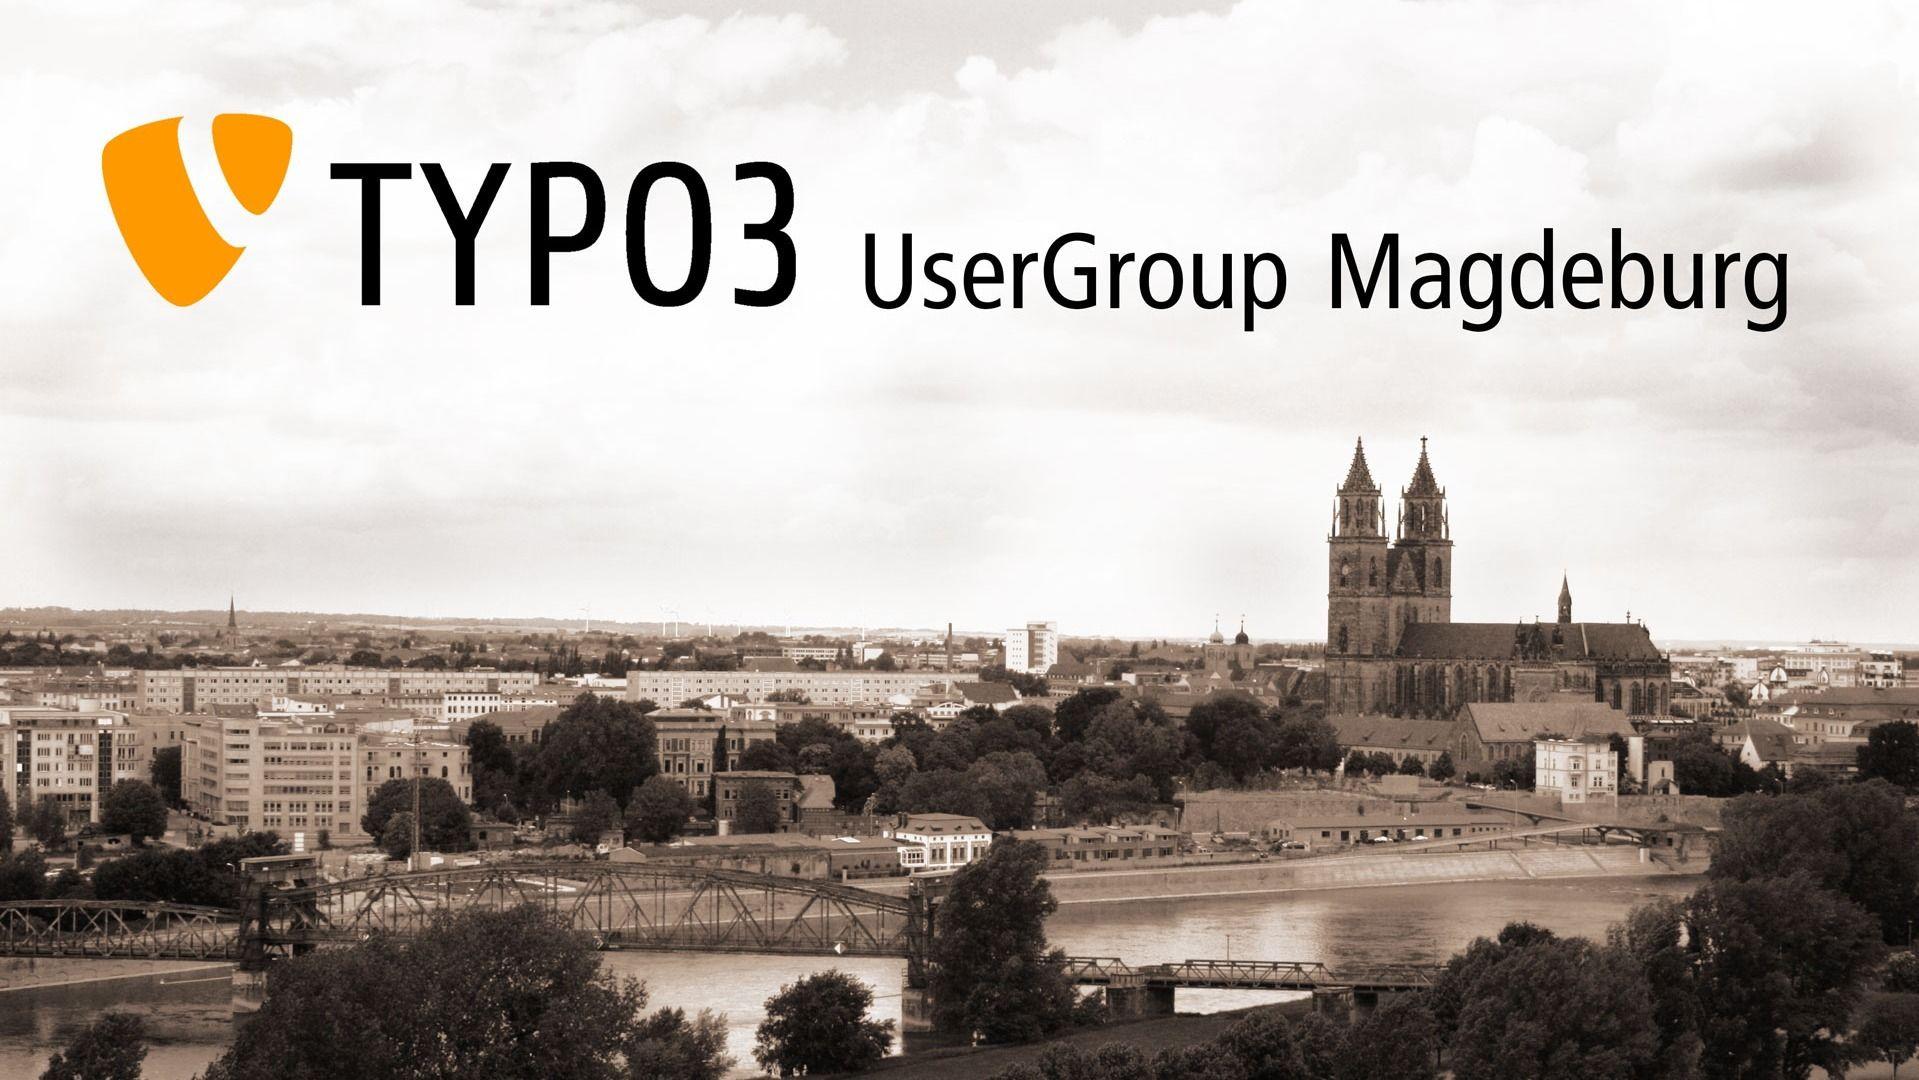 TYPO3 UserGroup Magdeburg